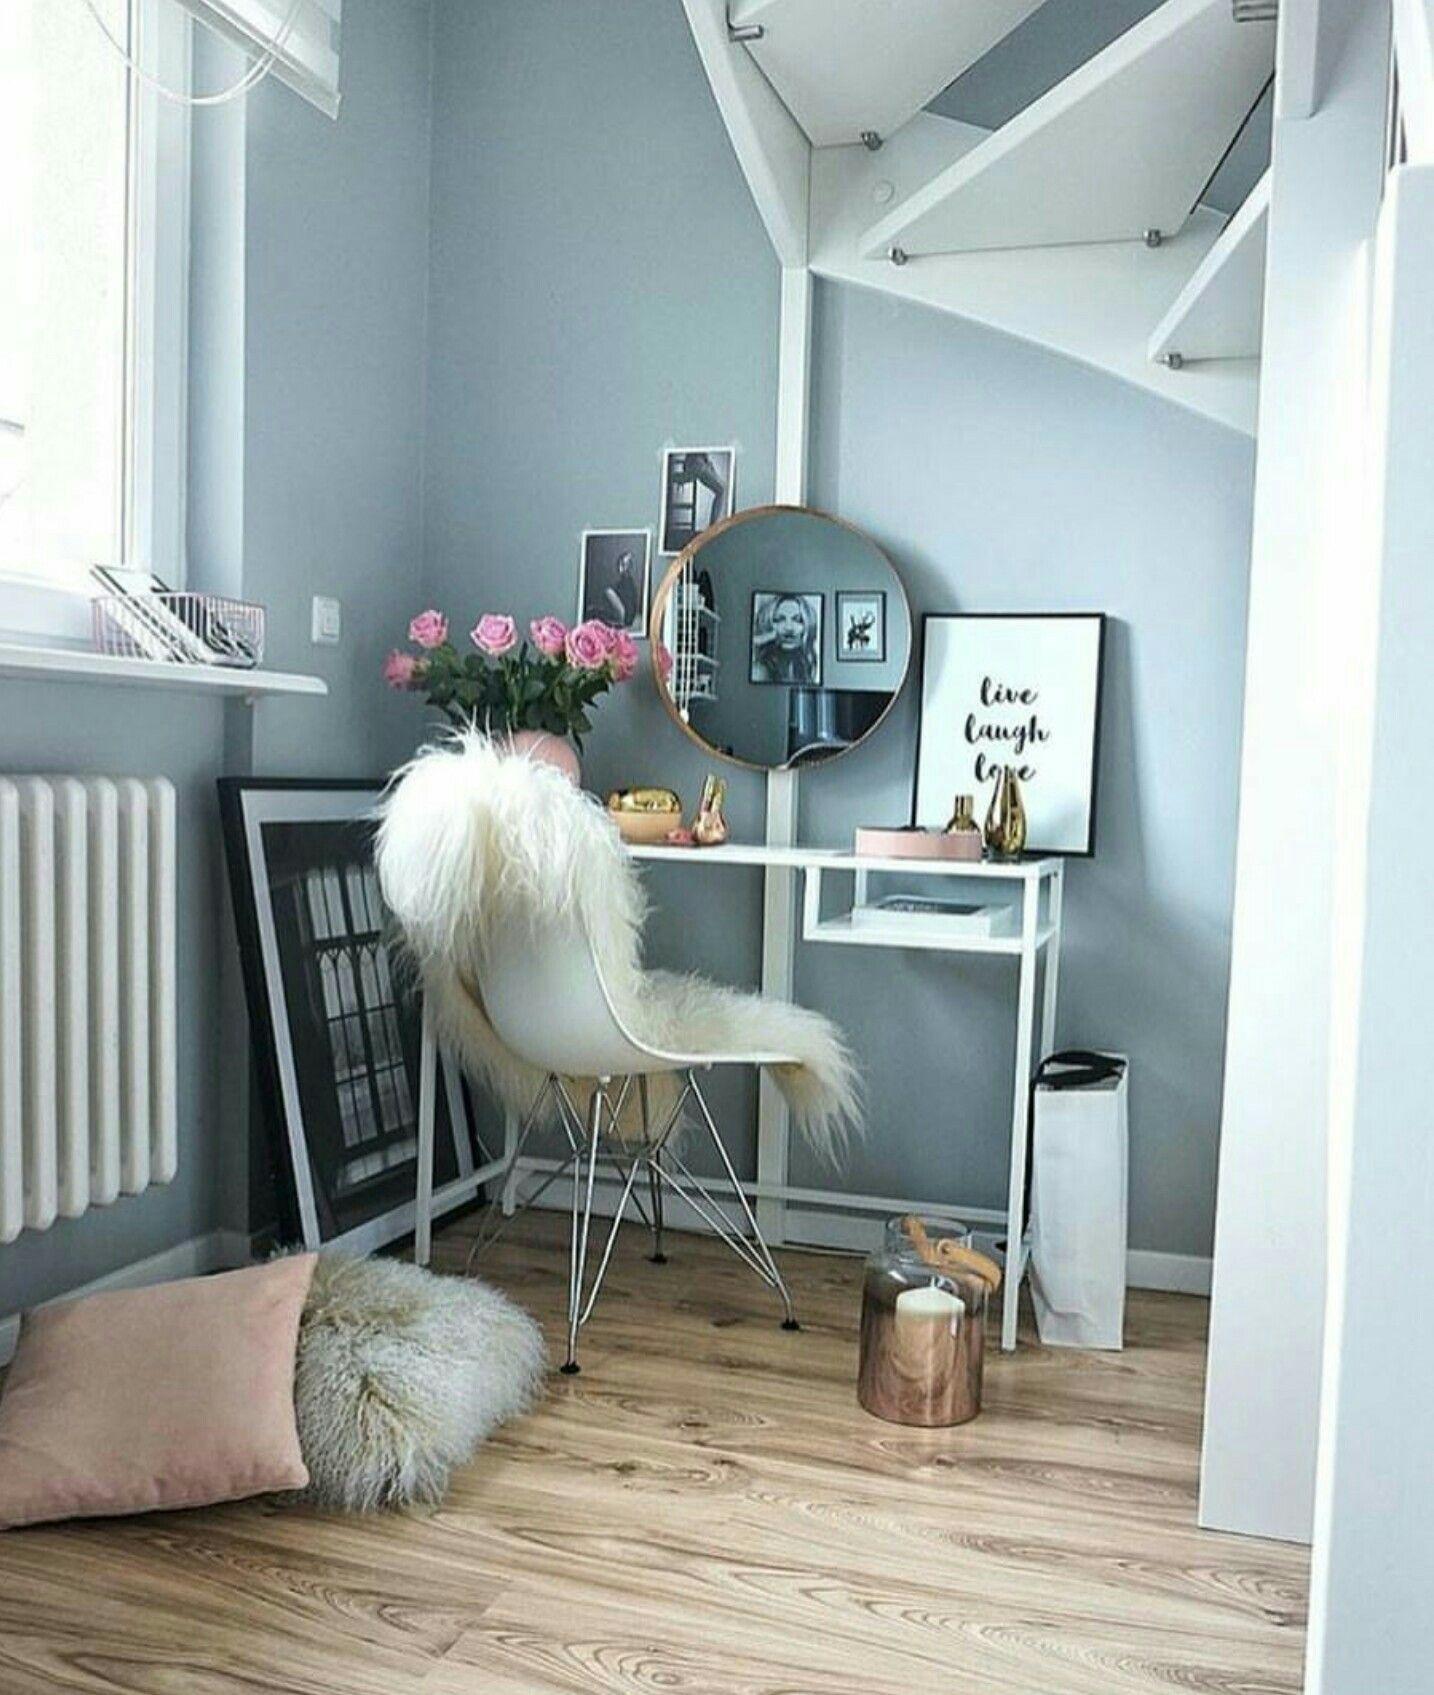 Ikea Design Bedroom Inspiration Pinalina Mikheyeva On Dream Home  Pinterest  Room Ideas Inspiration